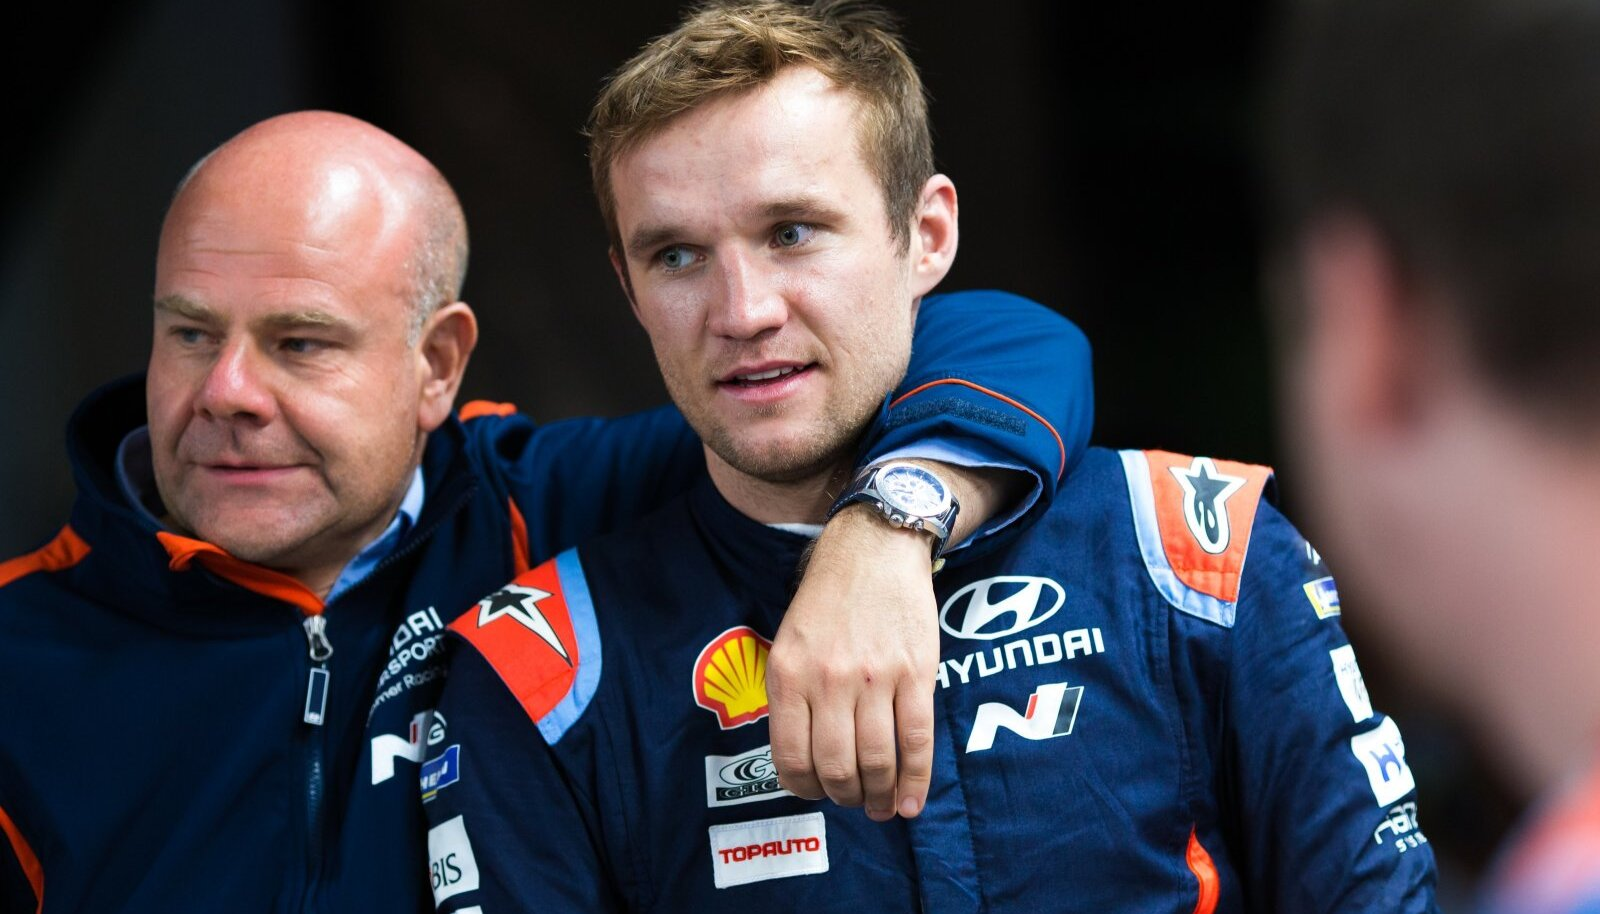 Martin Järveoja koos Hyundai tiimijuhi Andrea Adamoga.